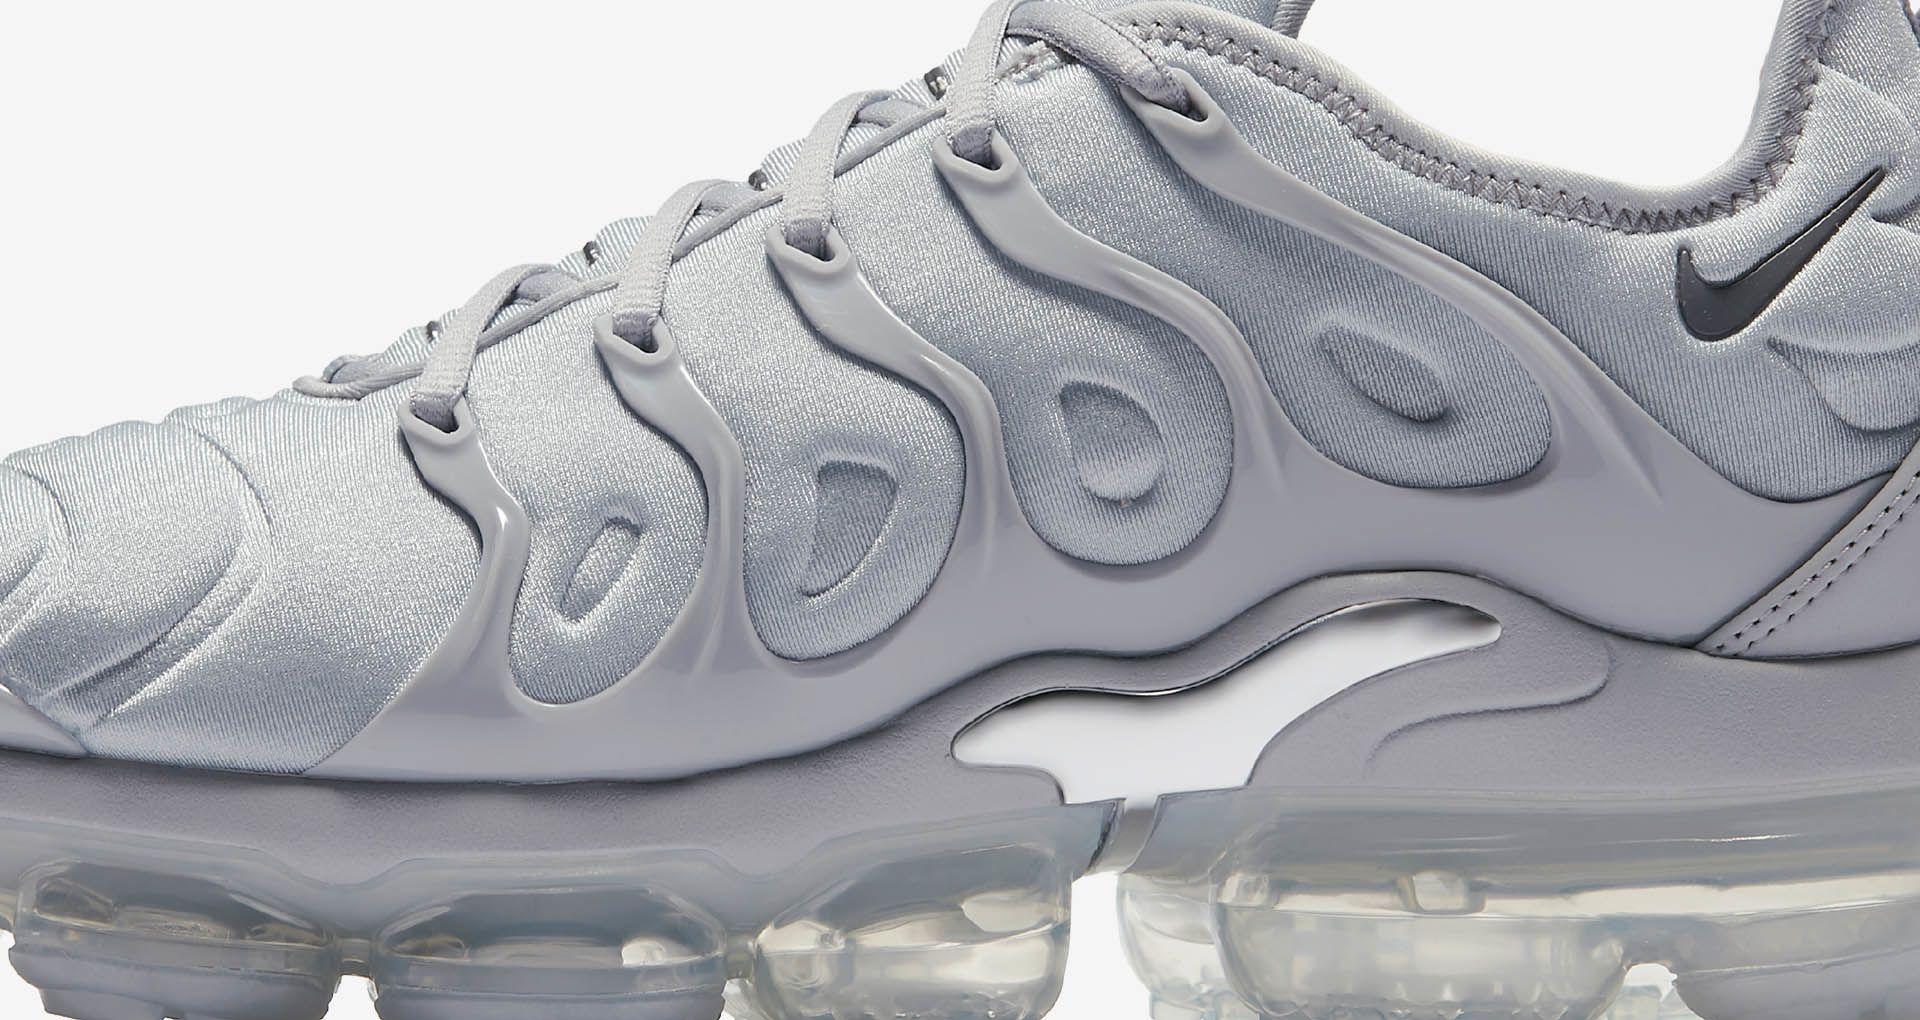 Nike Air Vapormax Plus 'Cool Grey & Metallic Silver' Release